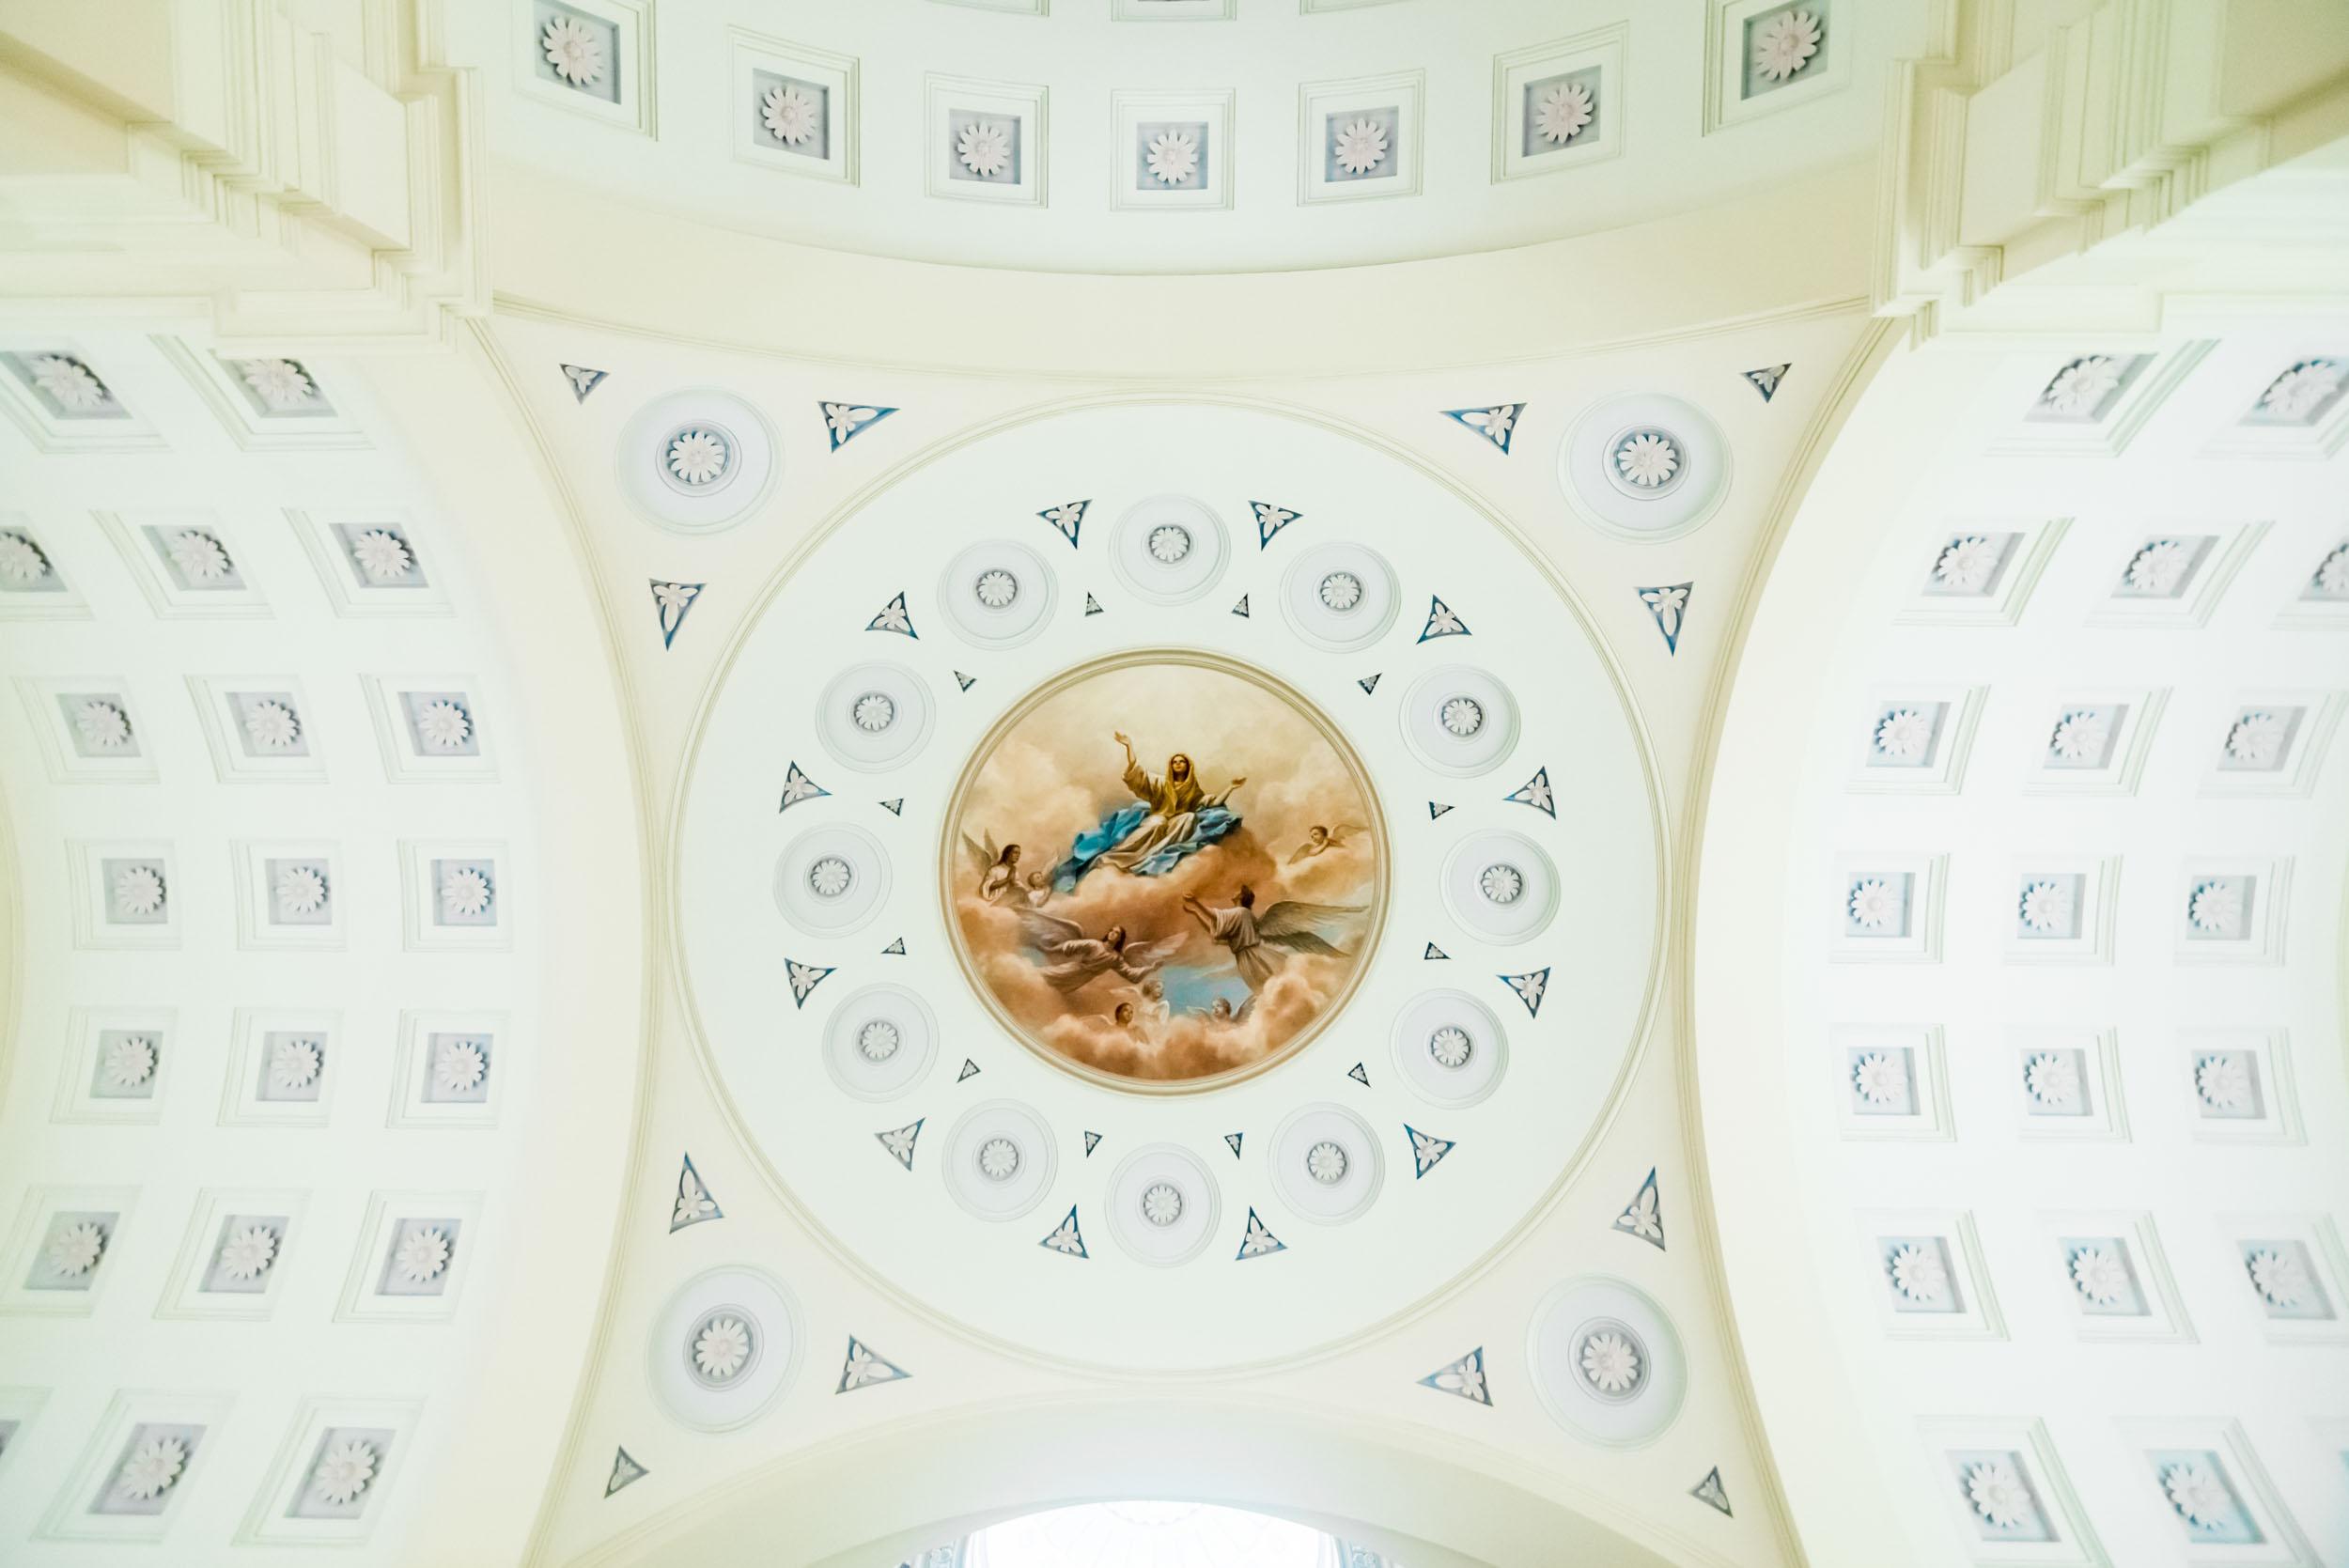 dc+metro+wedding+photographer+vadym+guliuk+photography+wedding+venue-2022.jpg